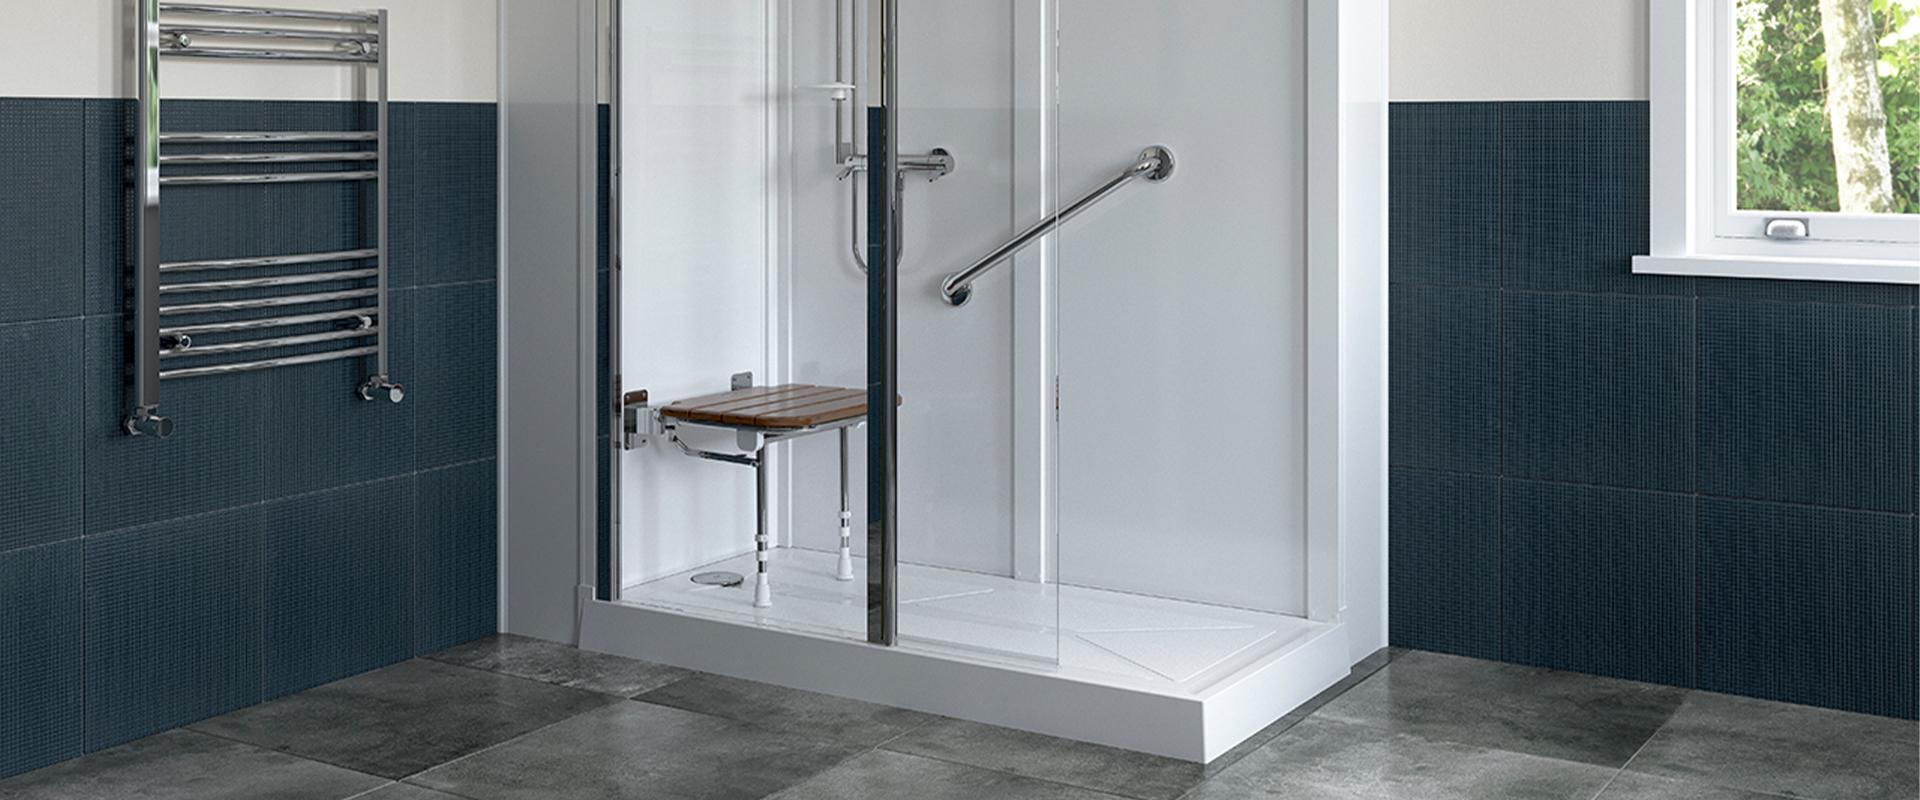 Walk in shower enclosures [city]